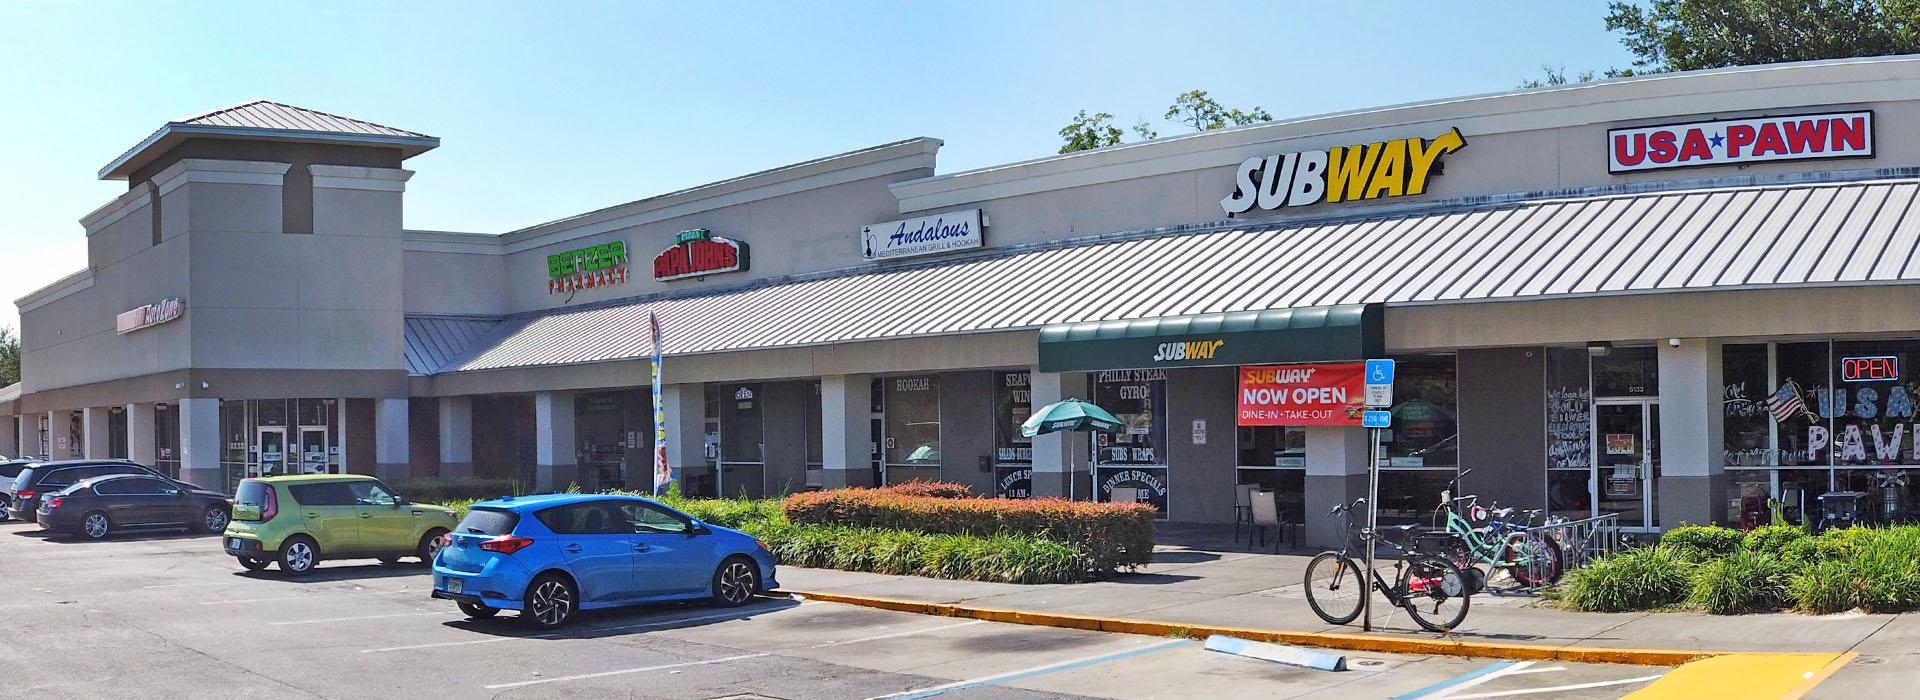 Lake Lucina Shopping Plaza Merril Road